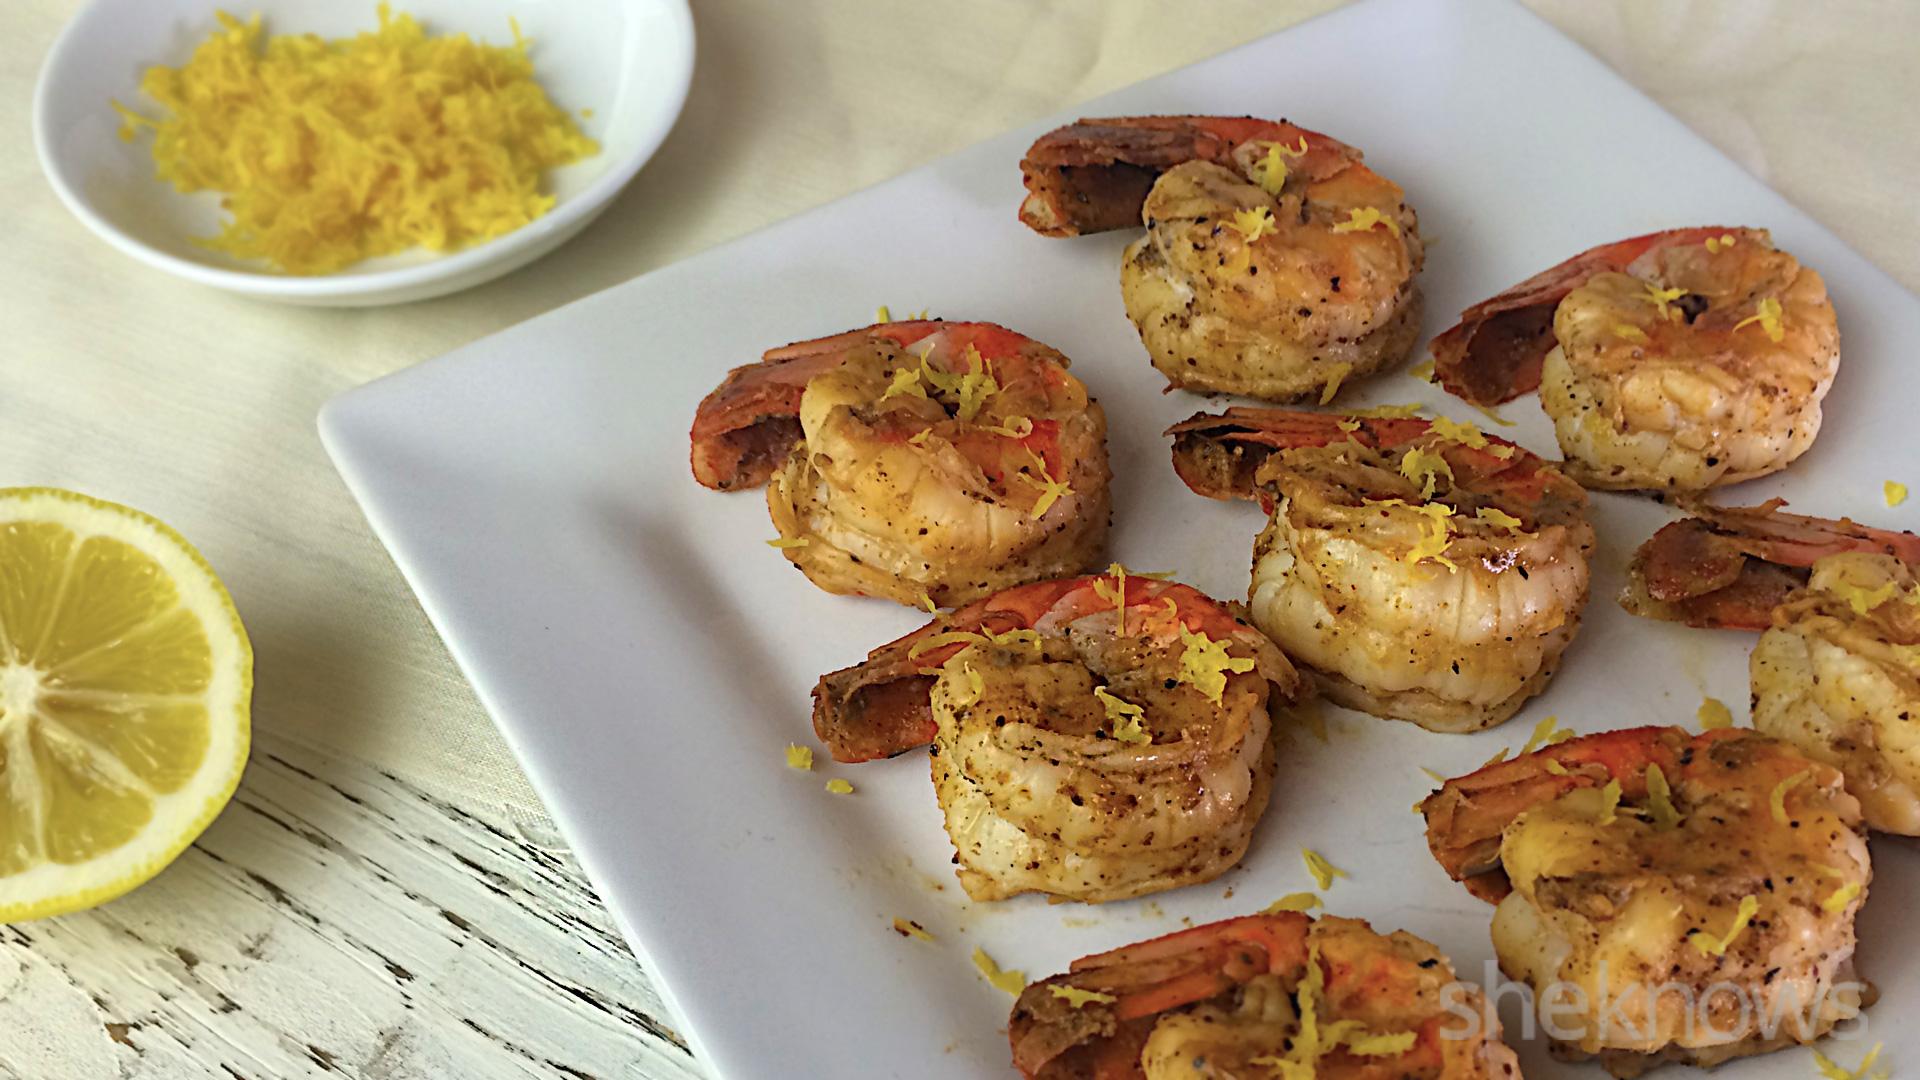 grilled shrimp topped with lemon zest